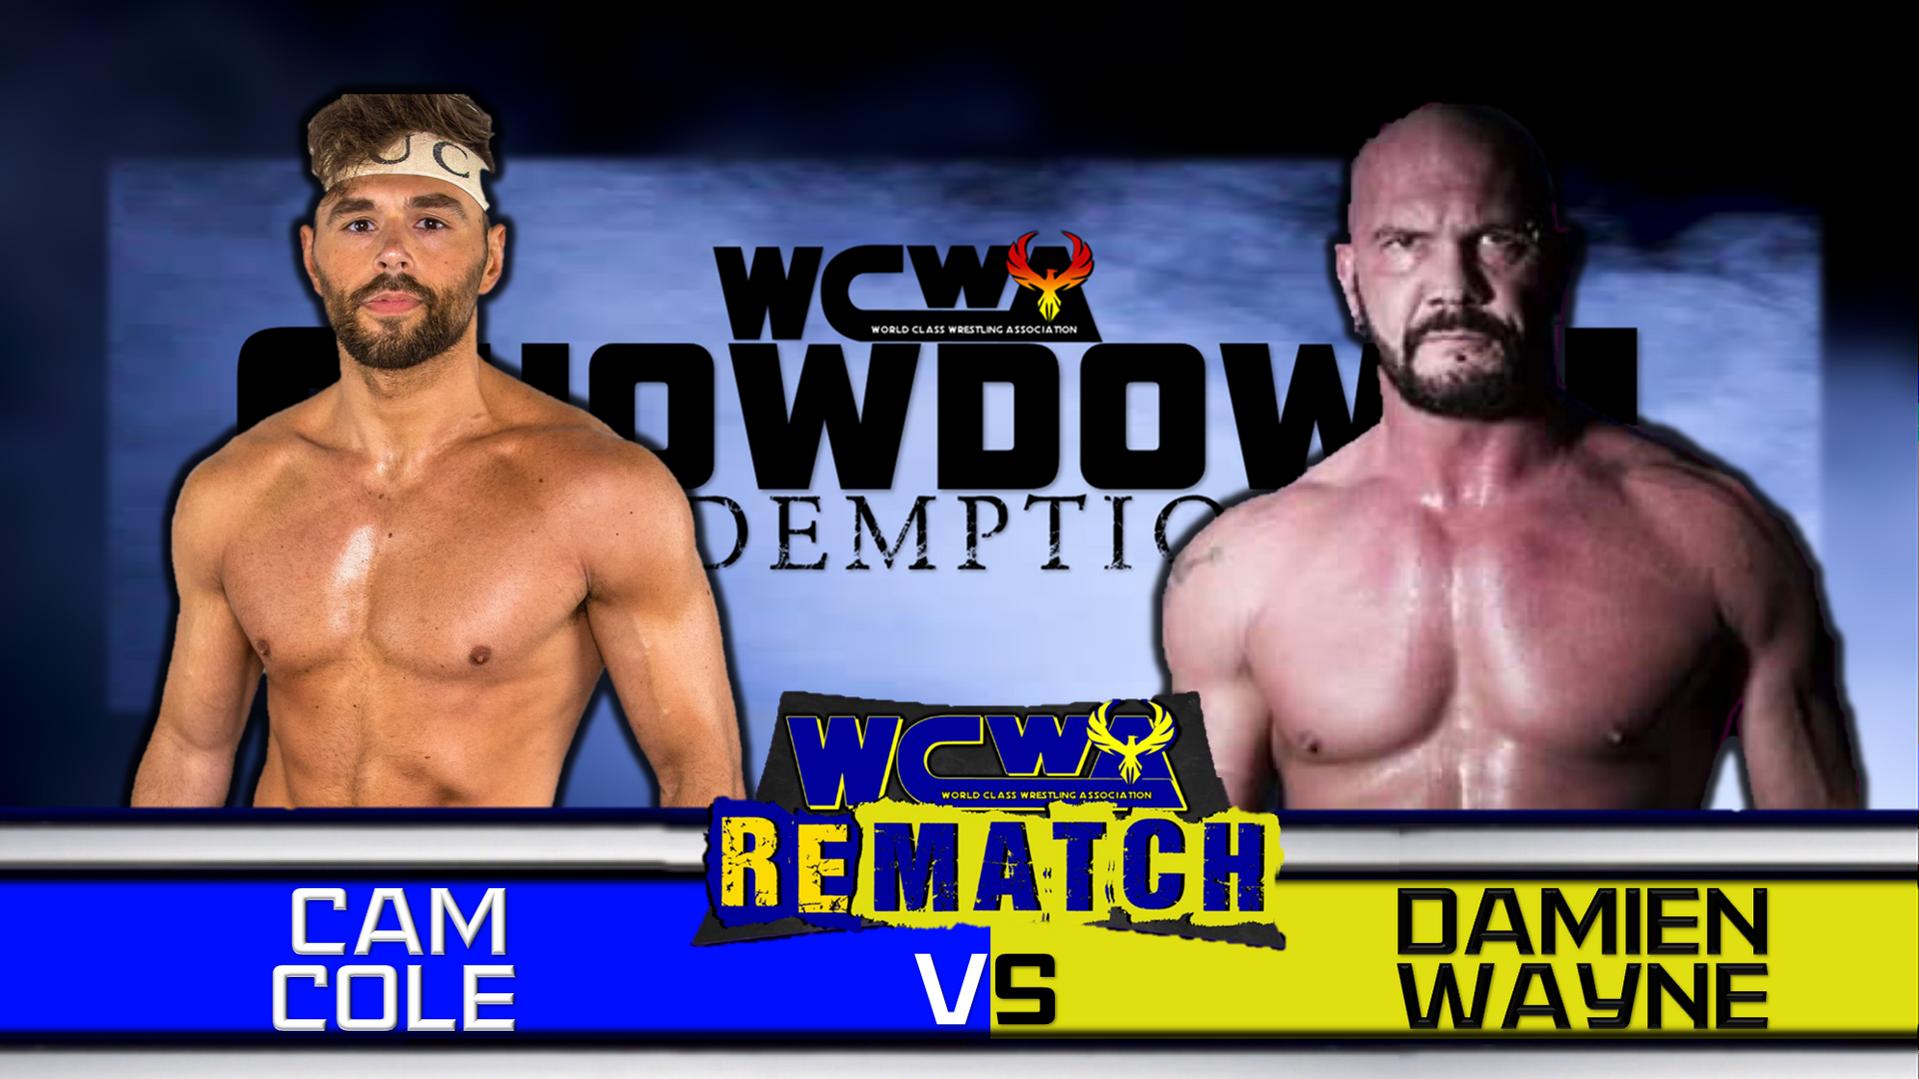 Damien Wayne vs Cam Cole